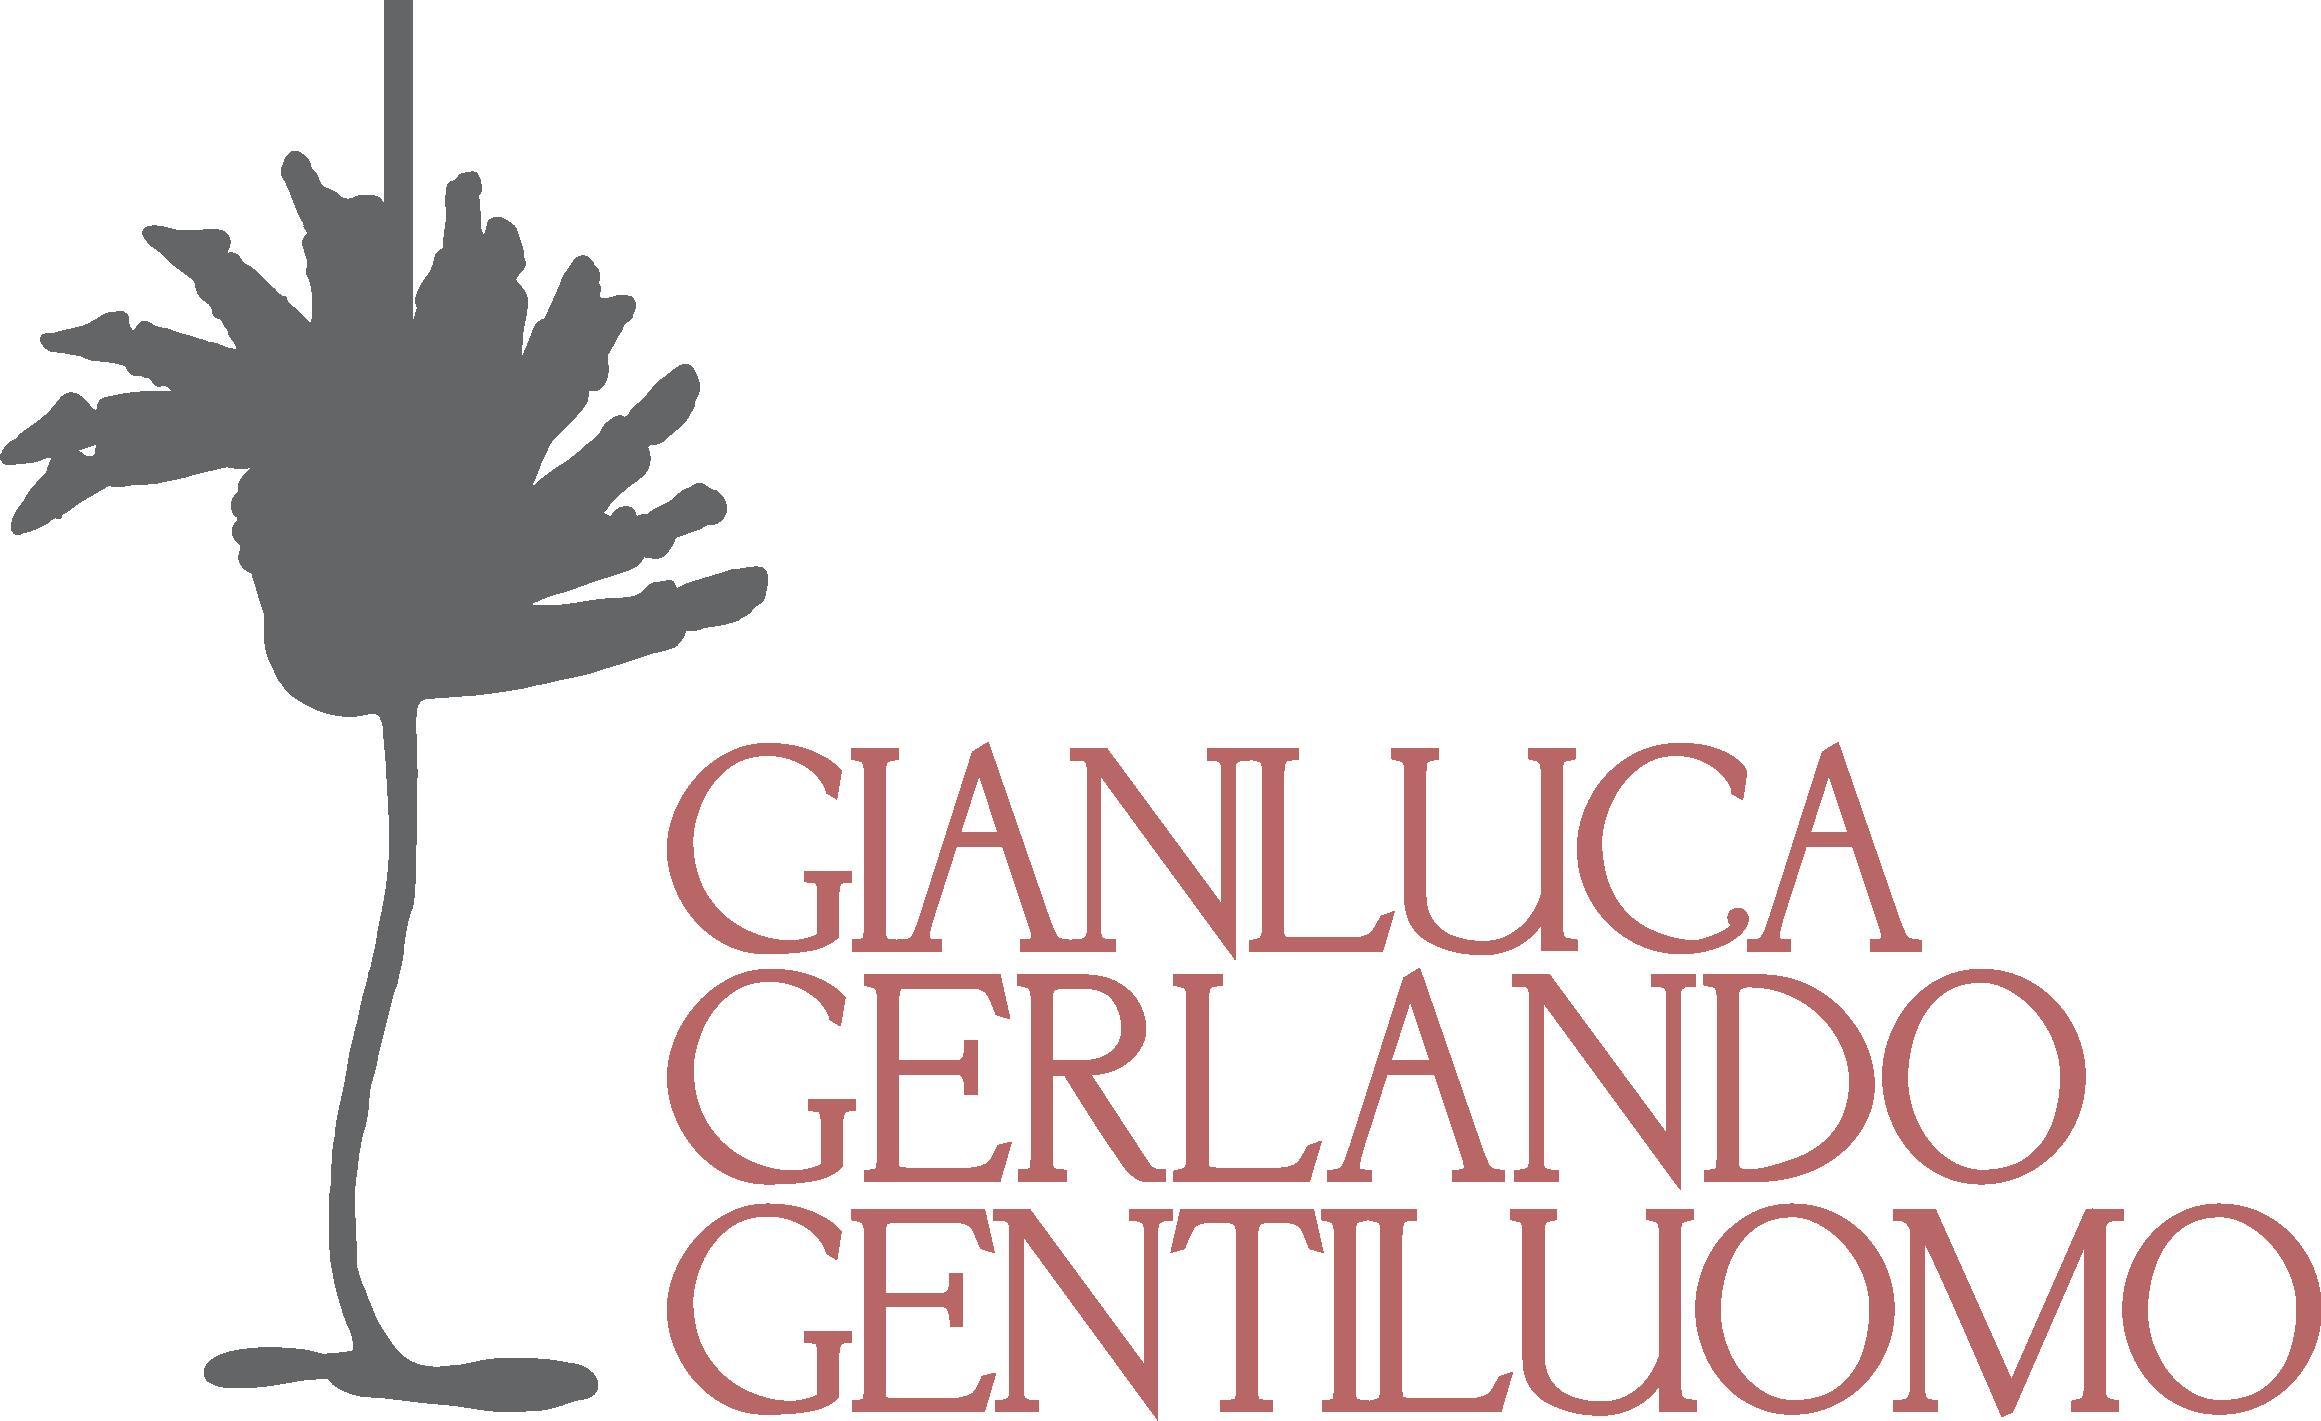 Gianluca Gerlando Gentiluomo